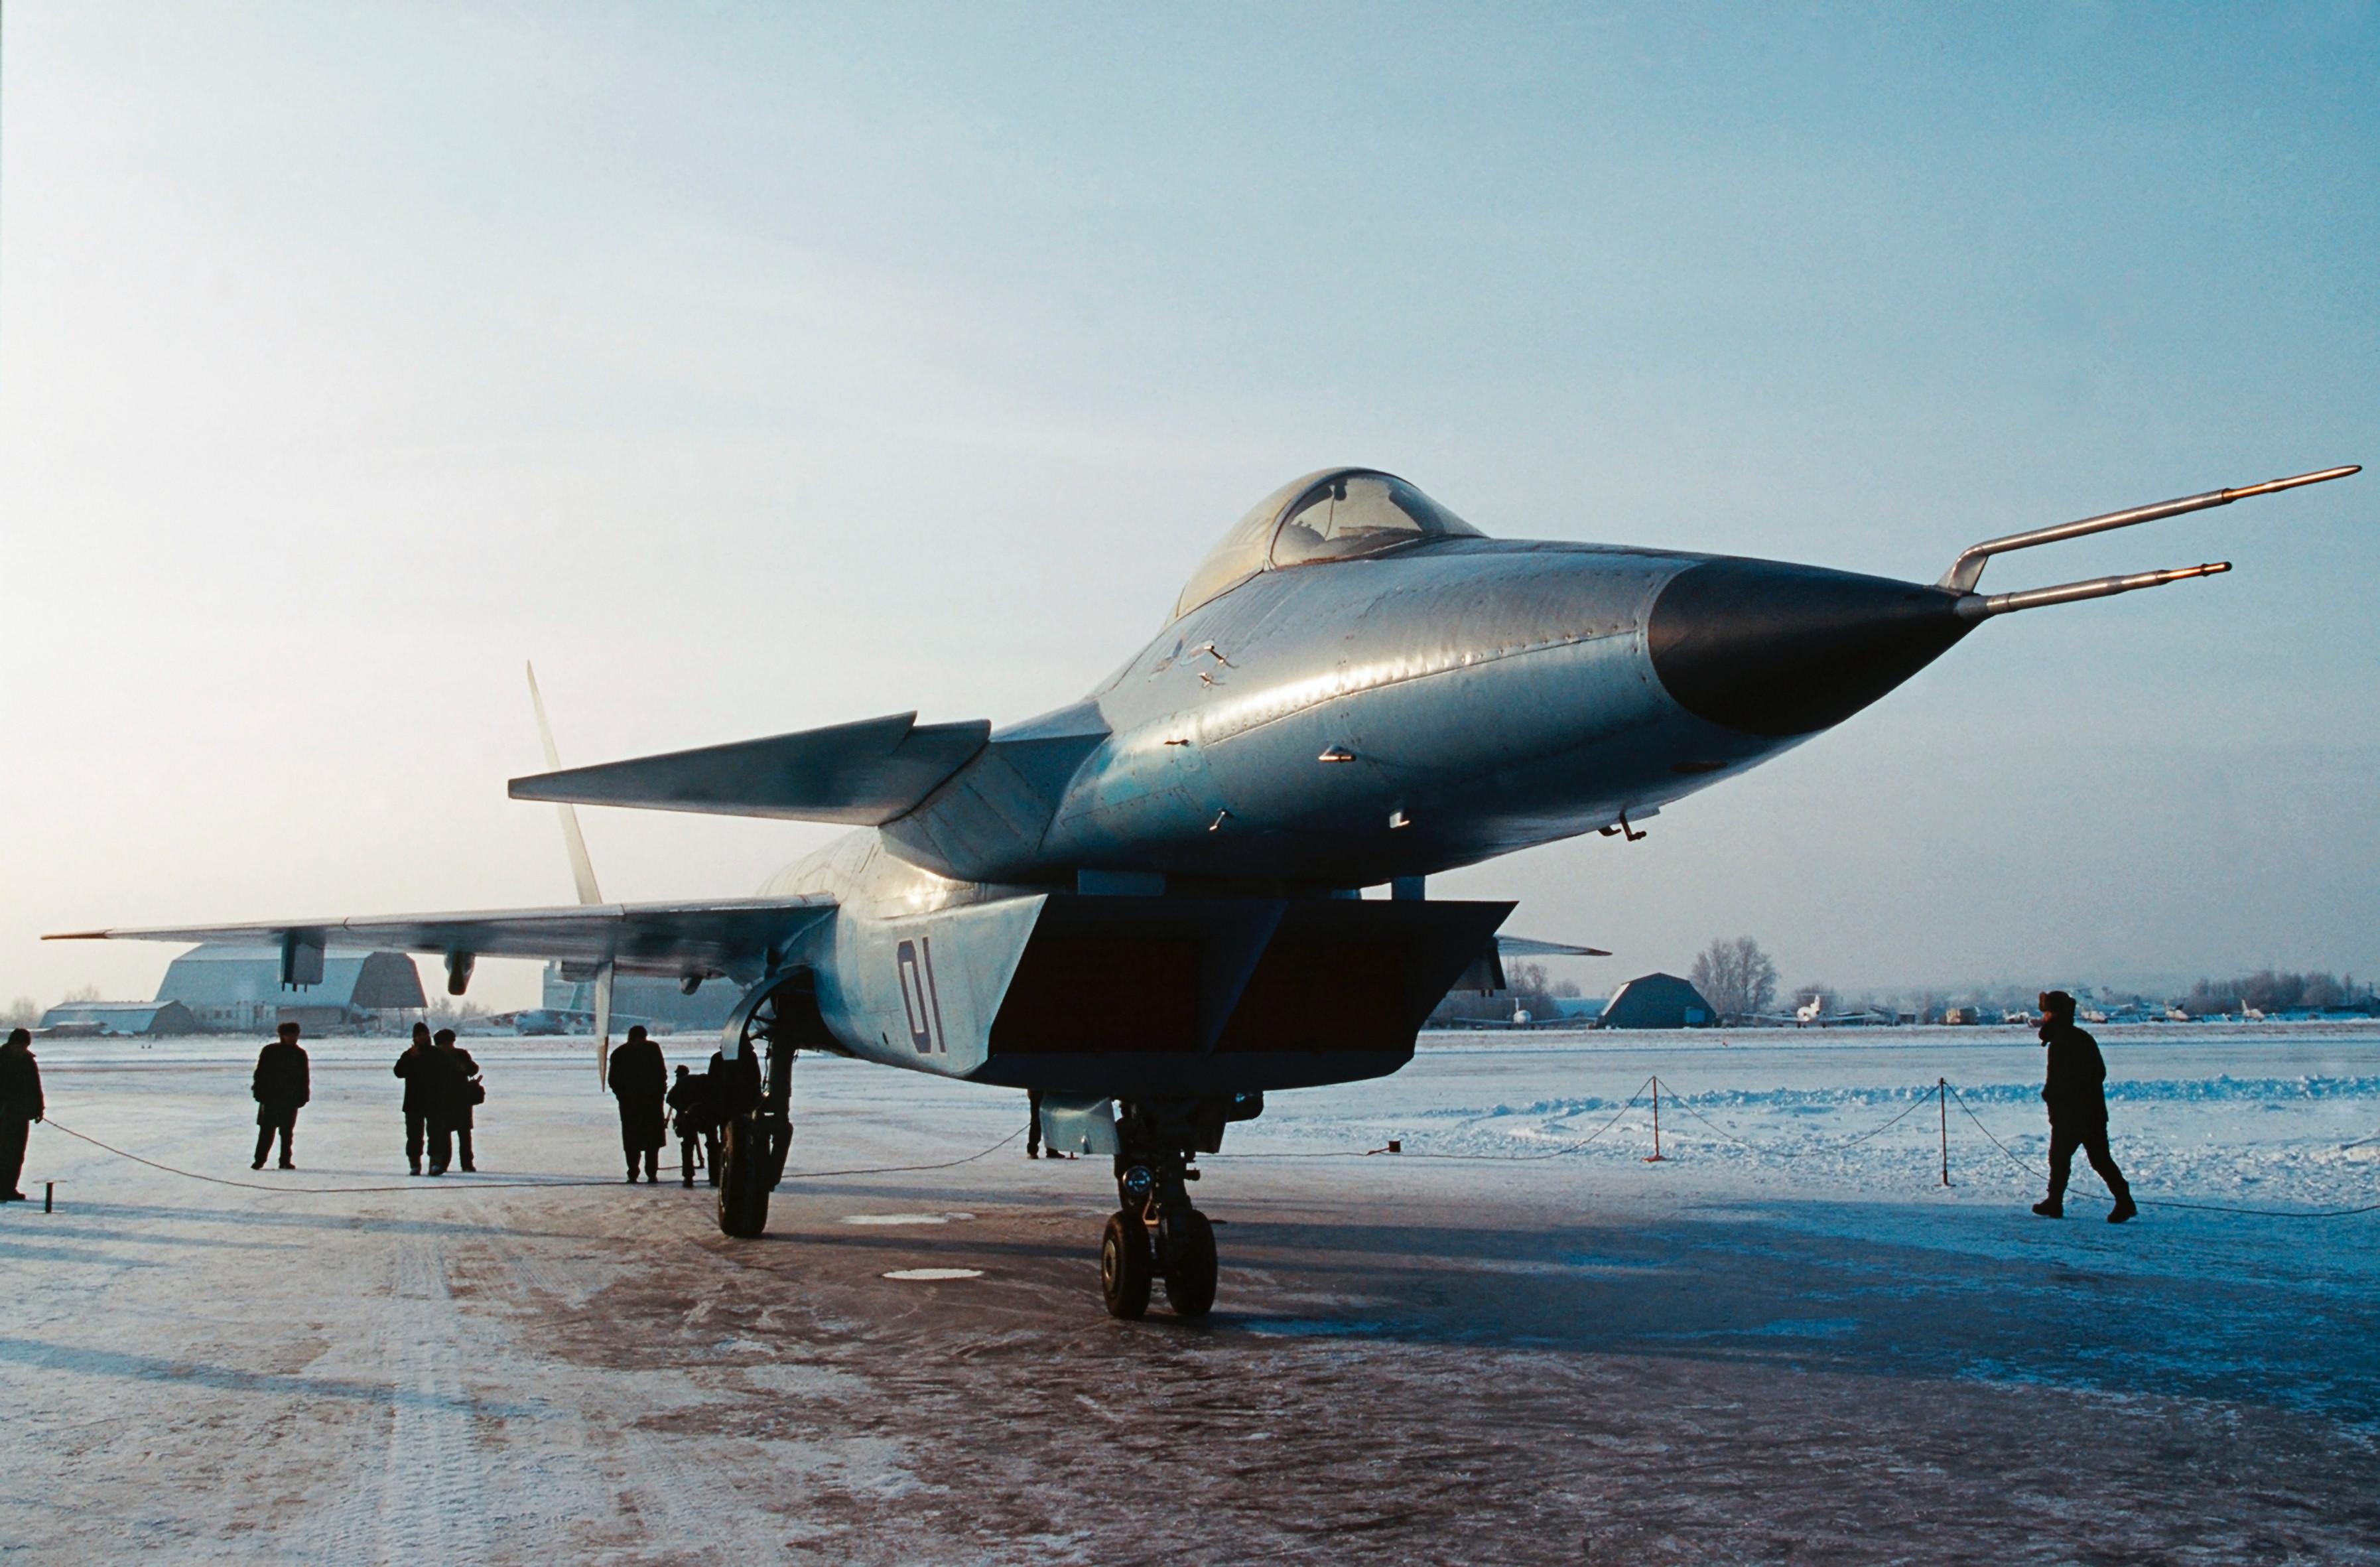 <p><span>Фото &copy;&nbsp;РИА Новости/Владимир Вяткин</span></p>